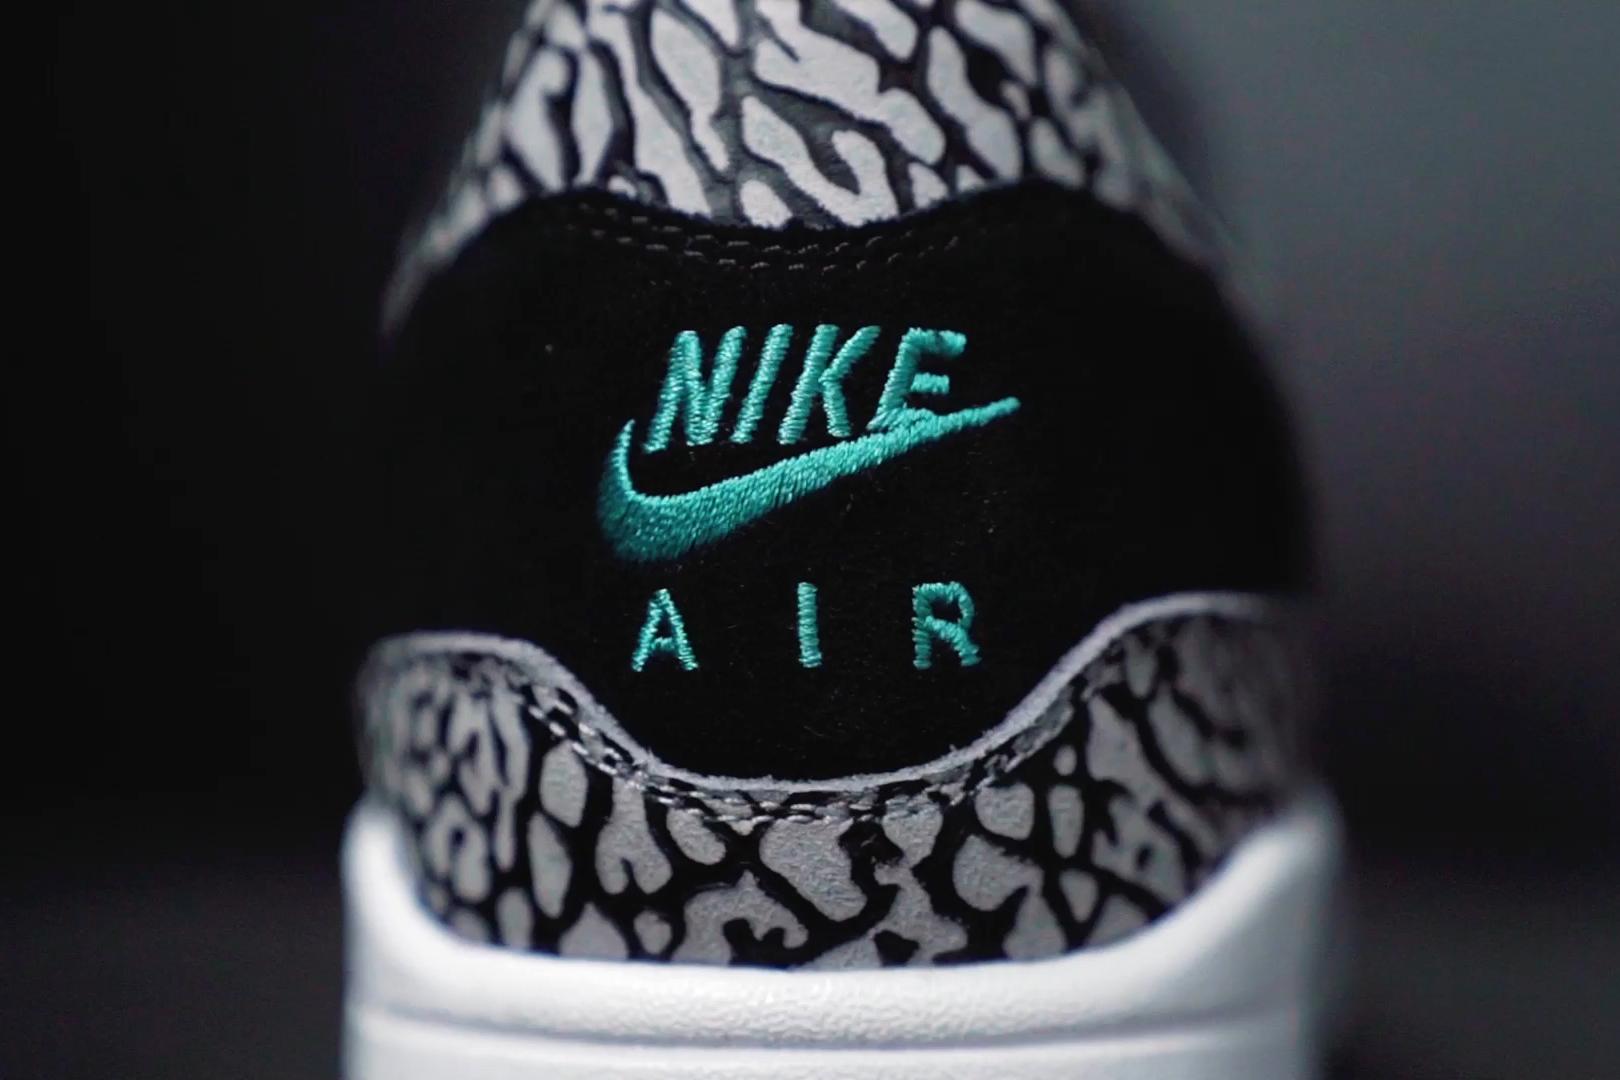 Atmos x Nike Air Max 1 'Elephant Print'